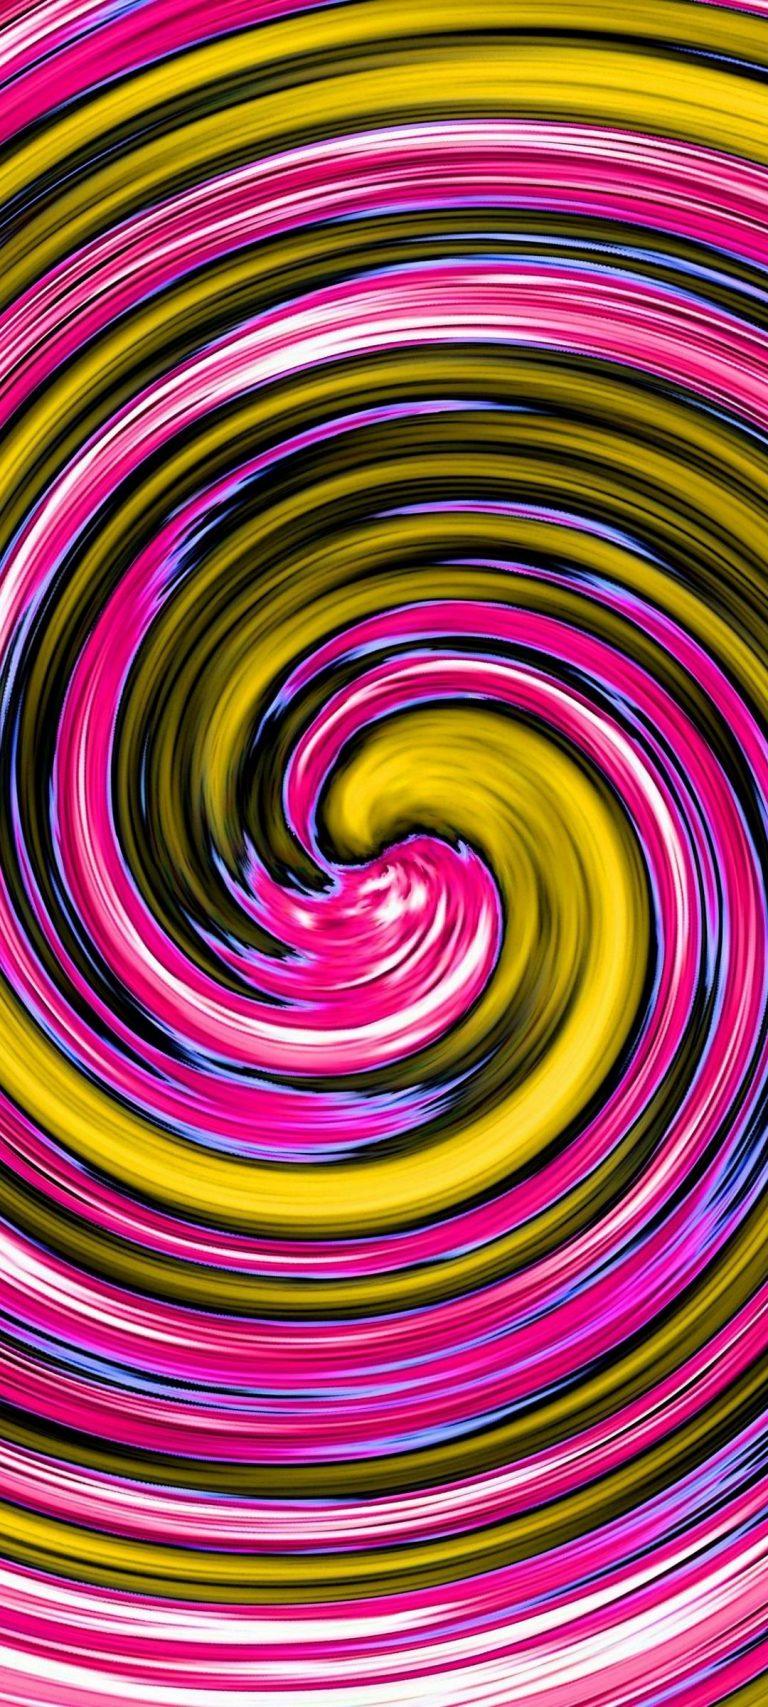 Multi Colored Spiral 1080x2400 768x1707